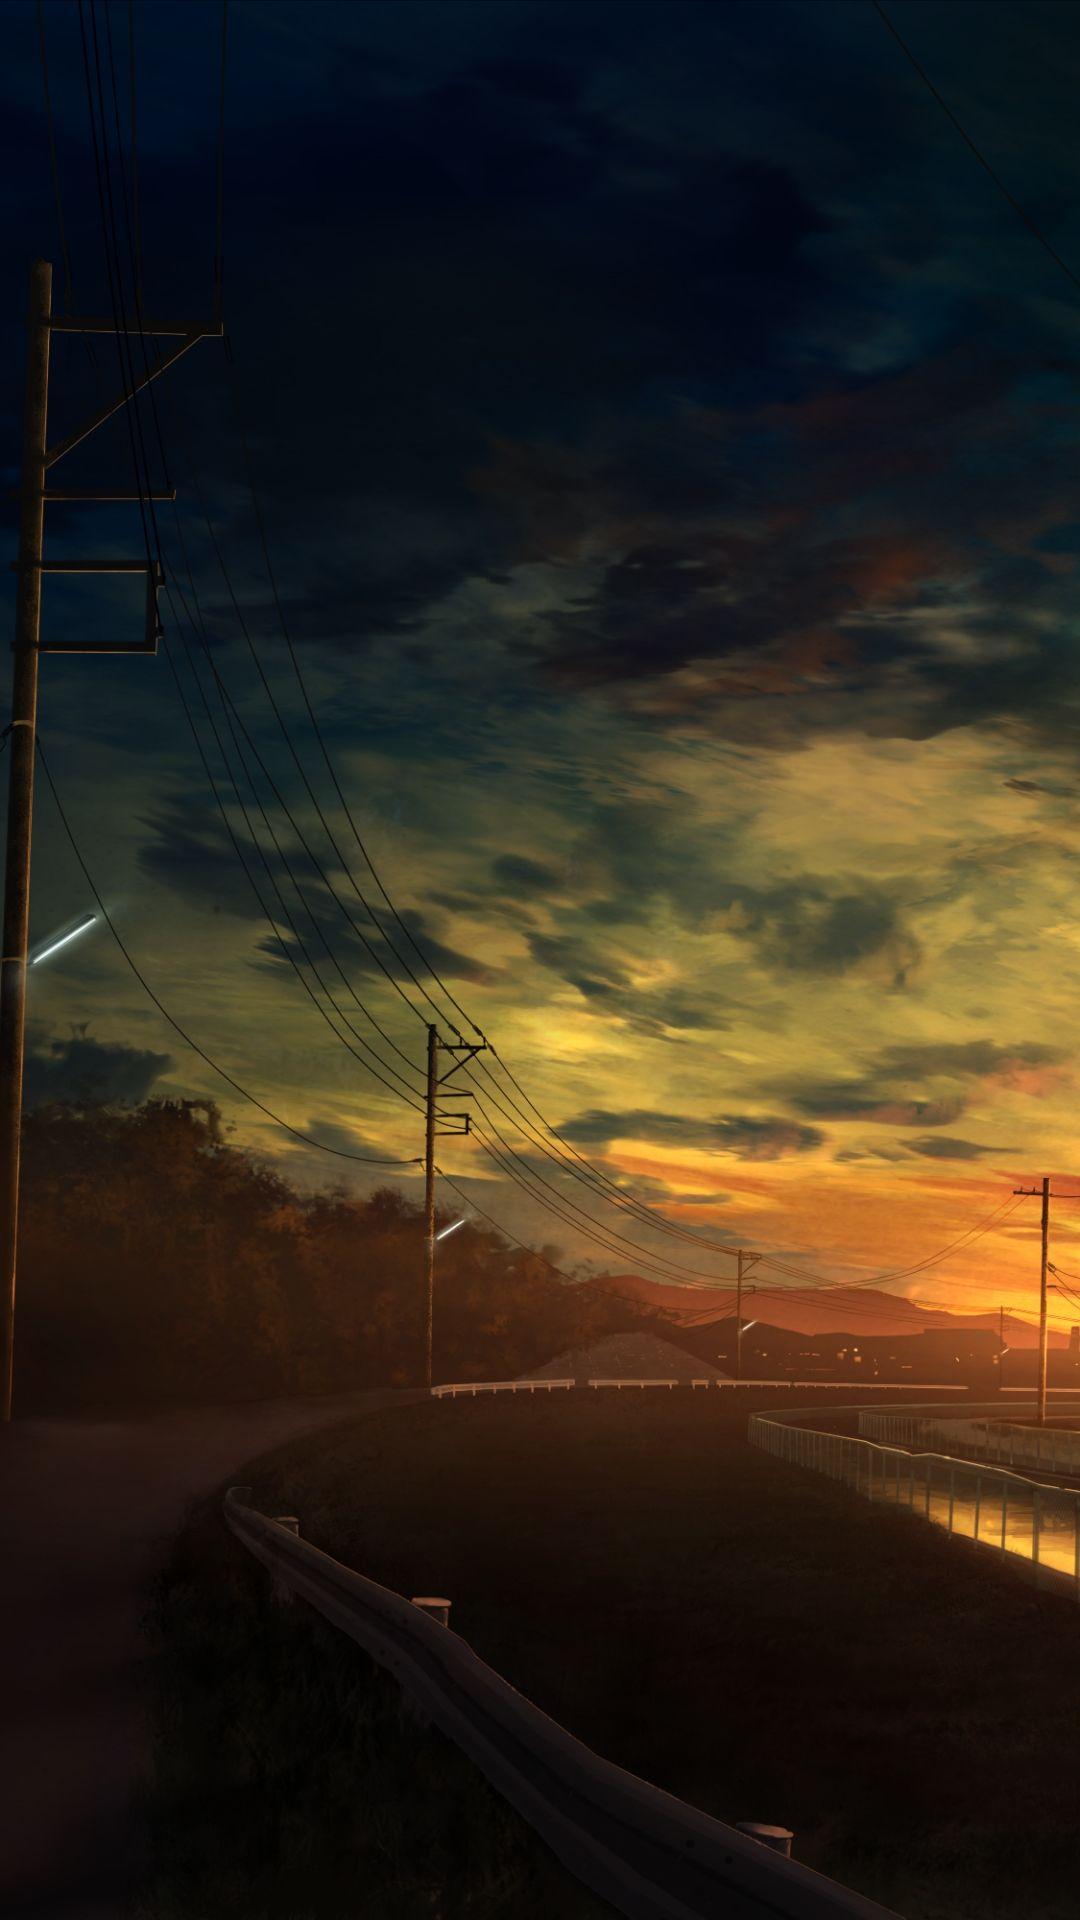 Sad Anime iPhone 6 Wallpaper